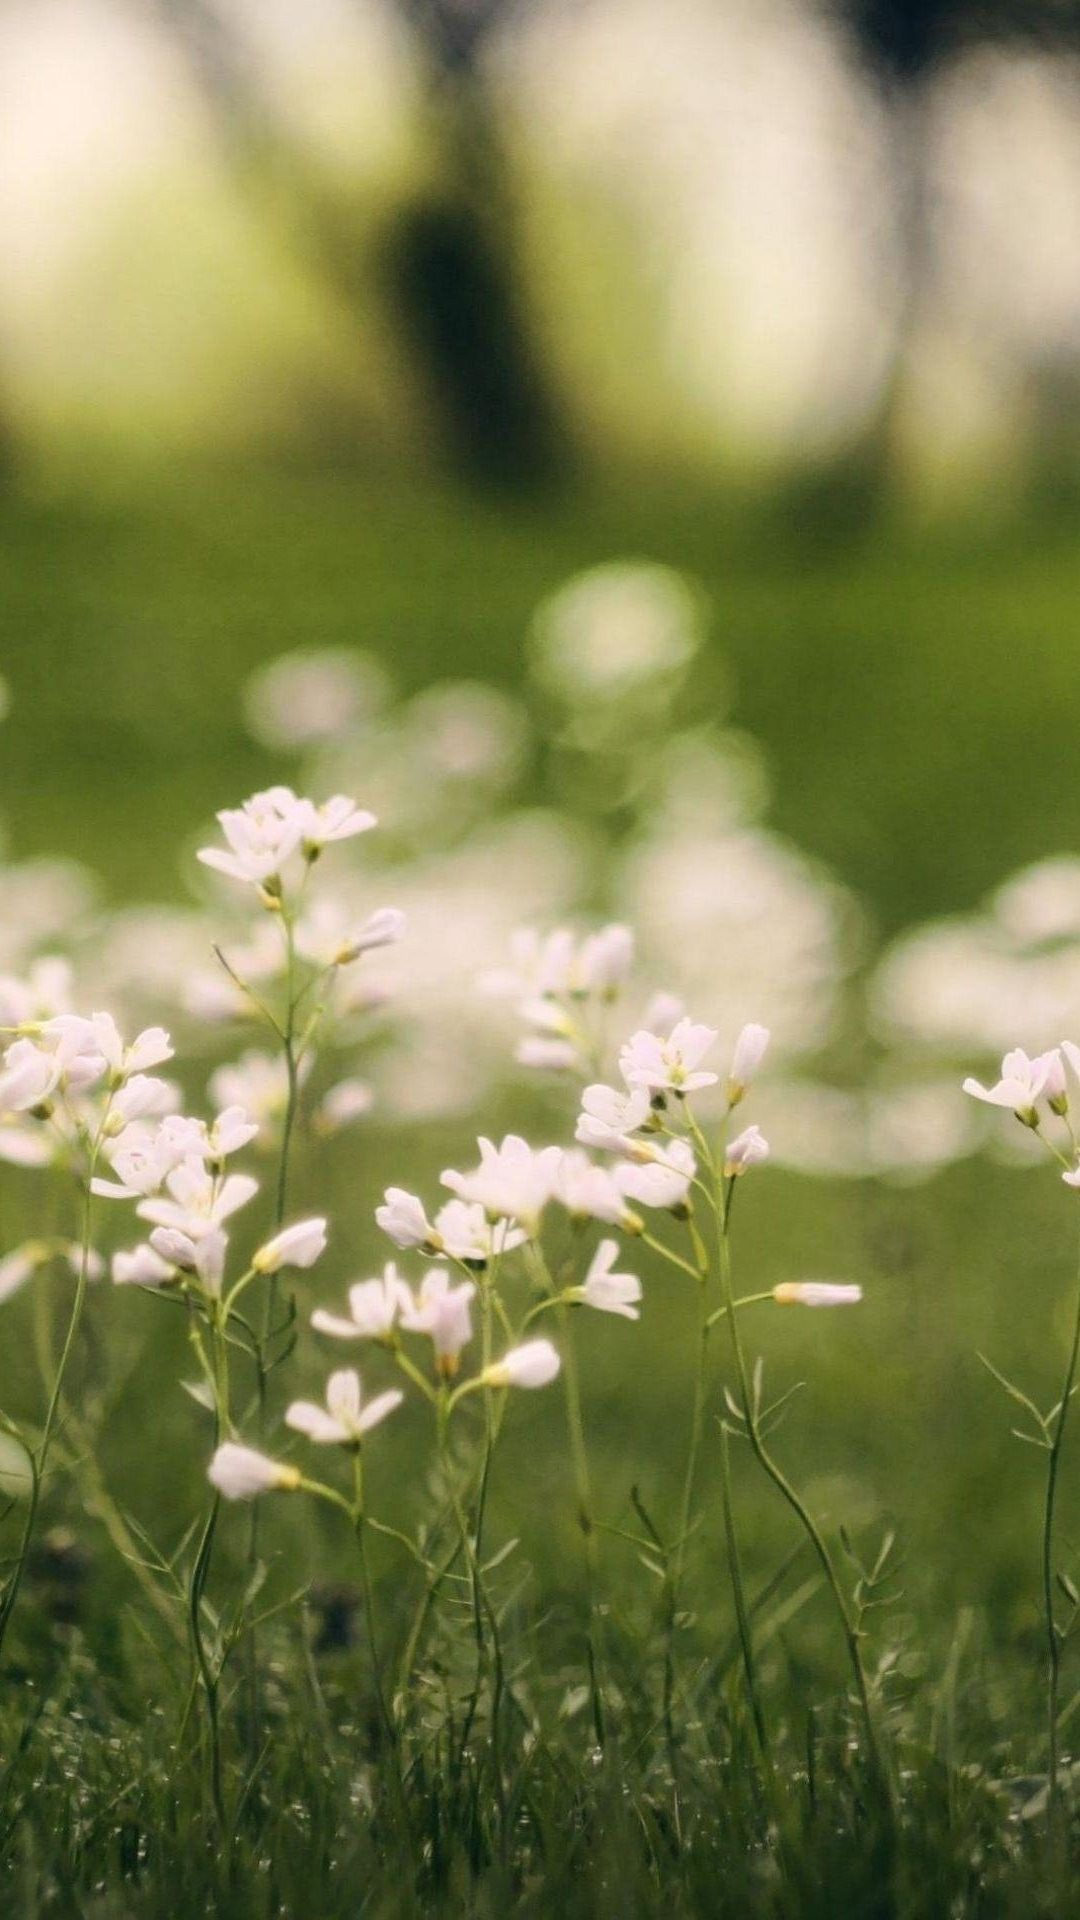 White Small Flowers Bokeh Macro Phone Wallpaper Hd